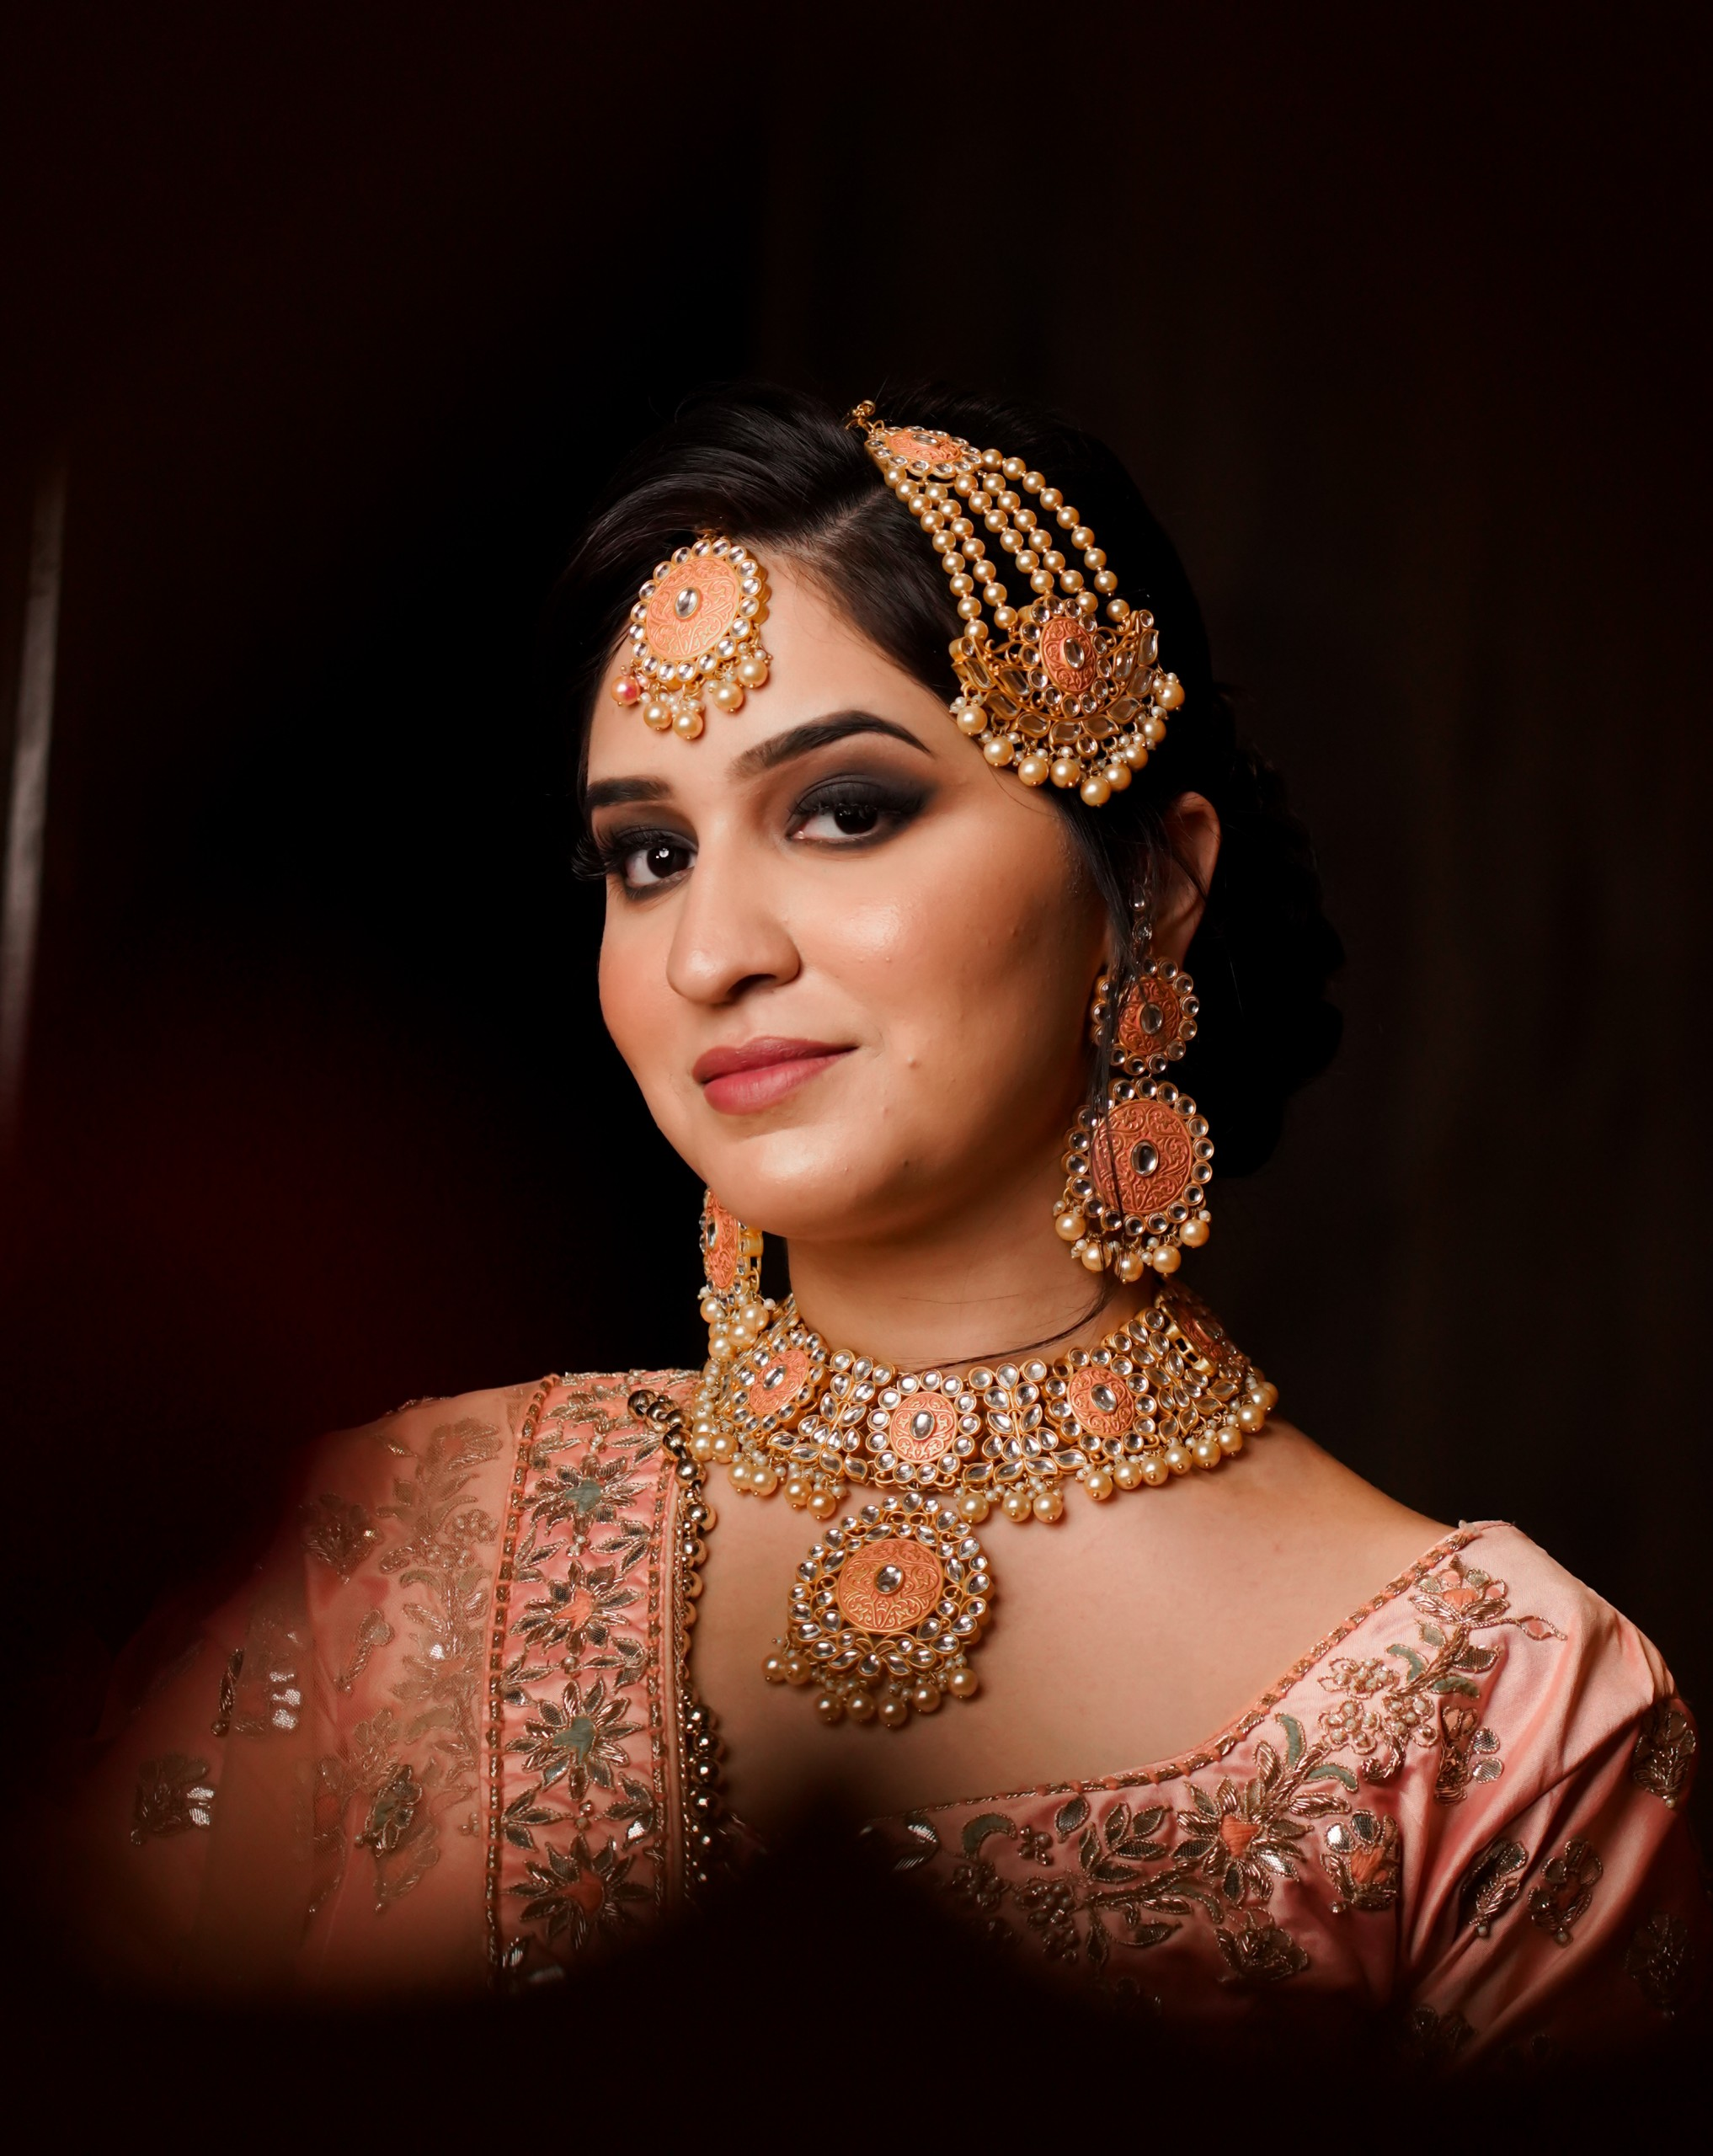 Indian Bride on Focus